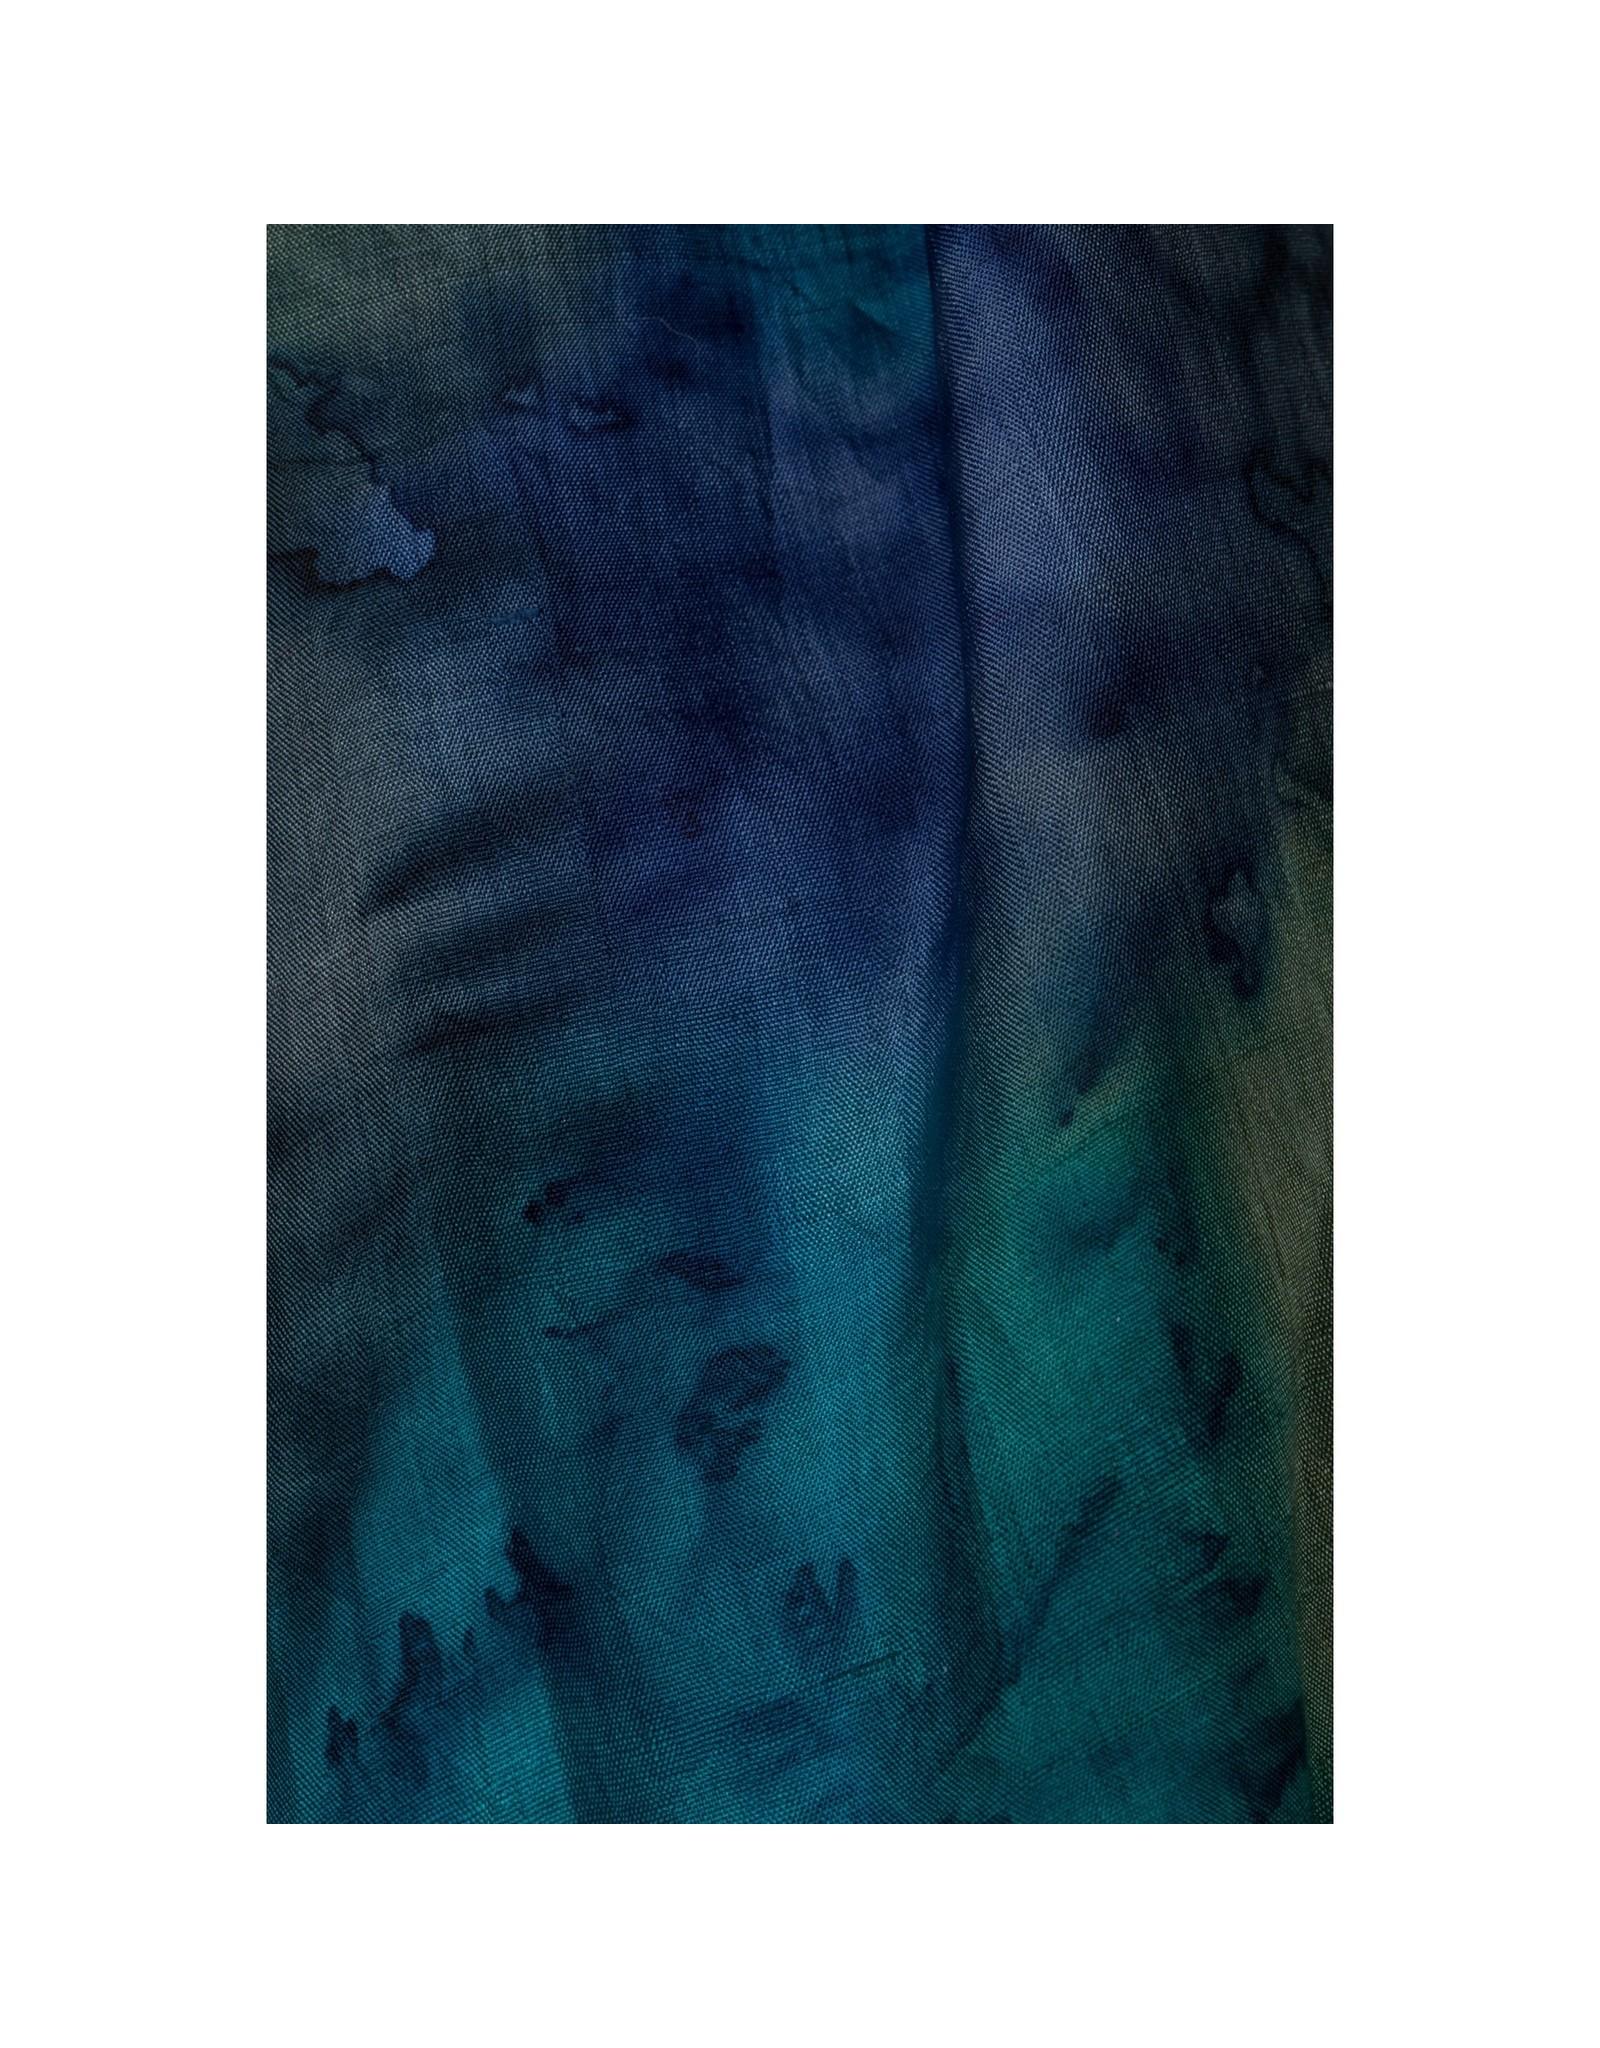 TTV USA Waterfall Painted Silk Scarf, India